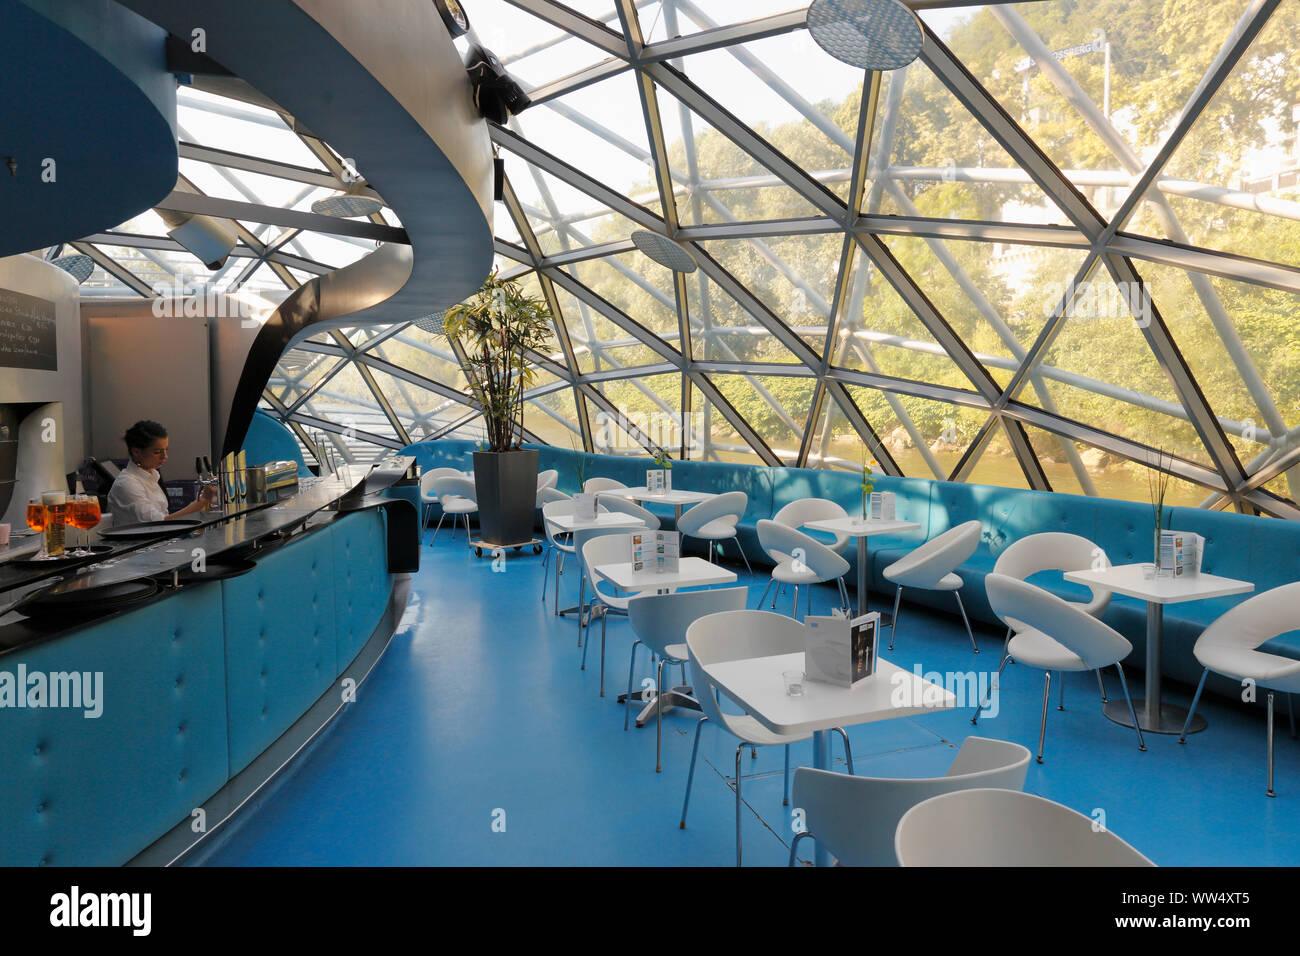 Café in Mur island, Graz, Styria, Austria Stock Photo